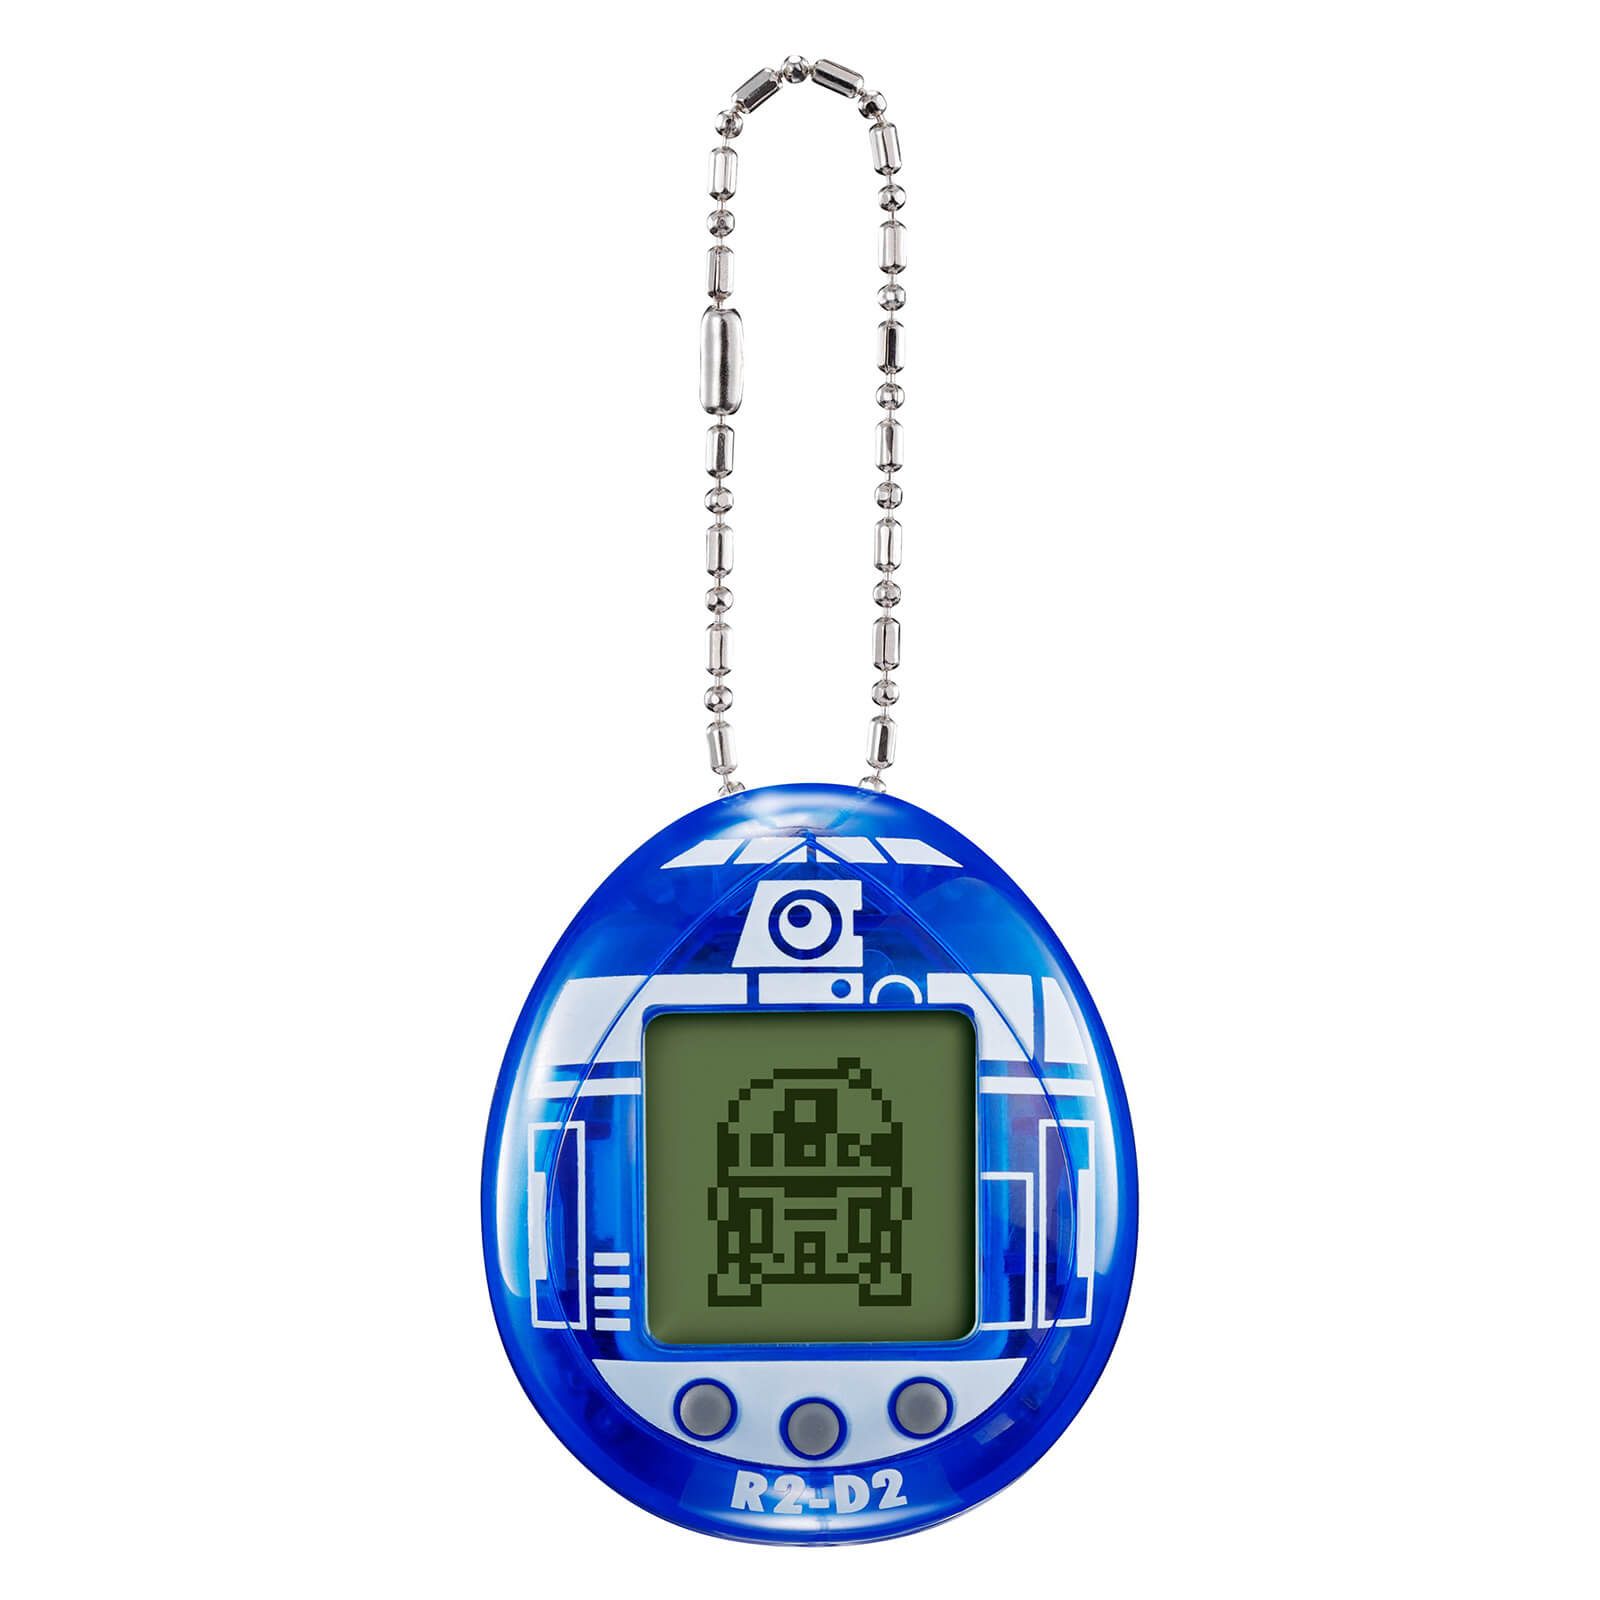 Star Wars R2-D2 Tamagotchi Blue